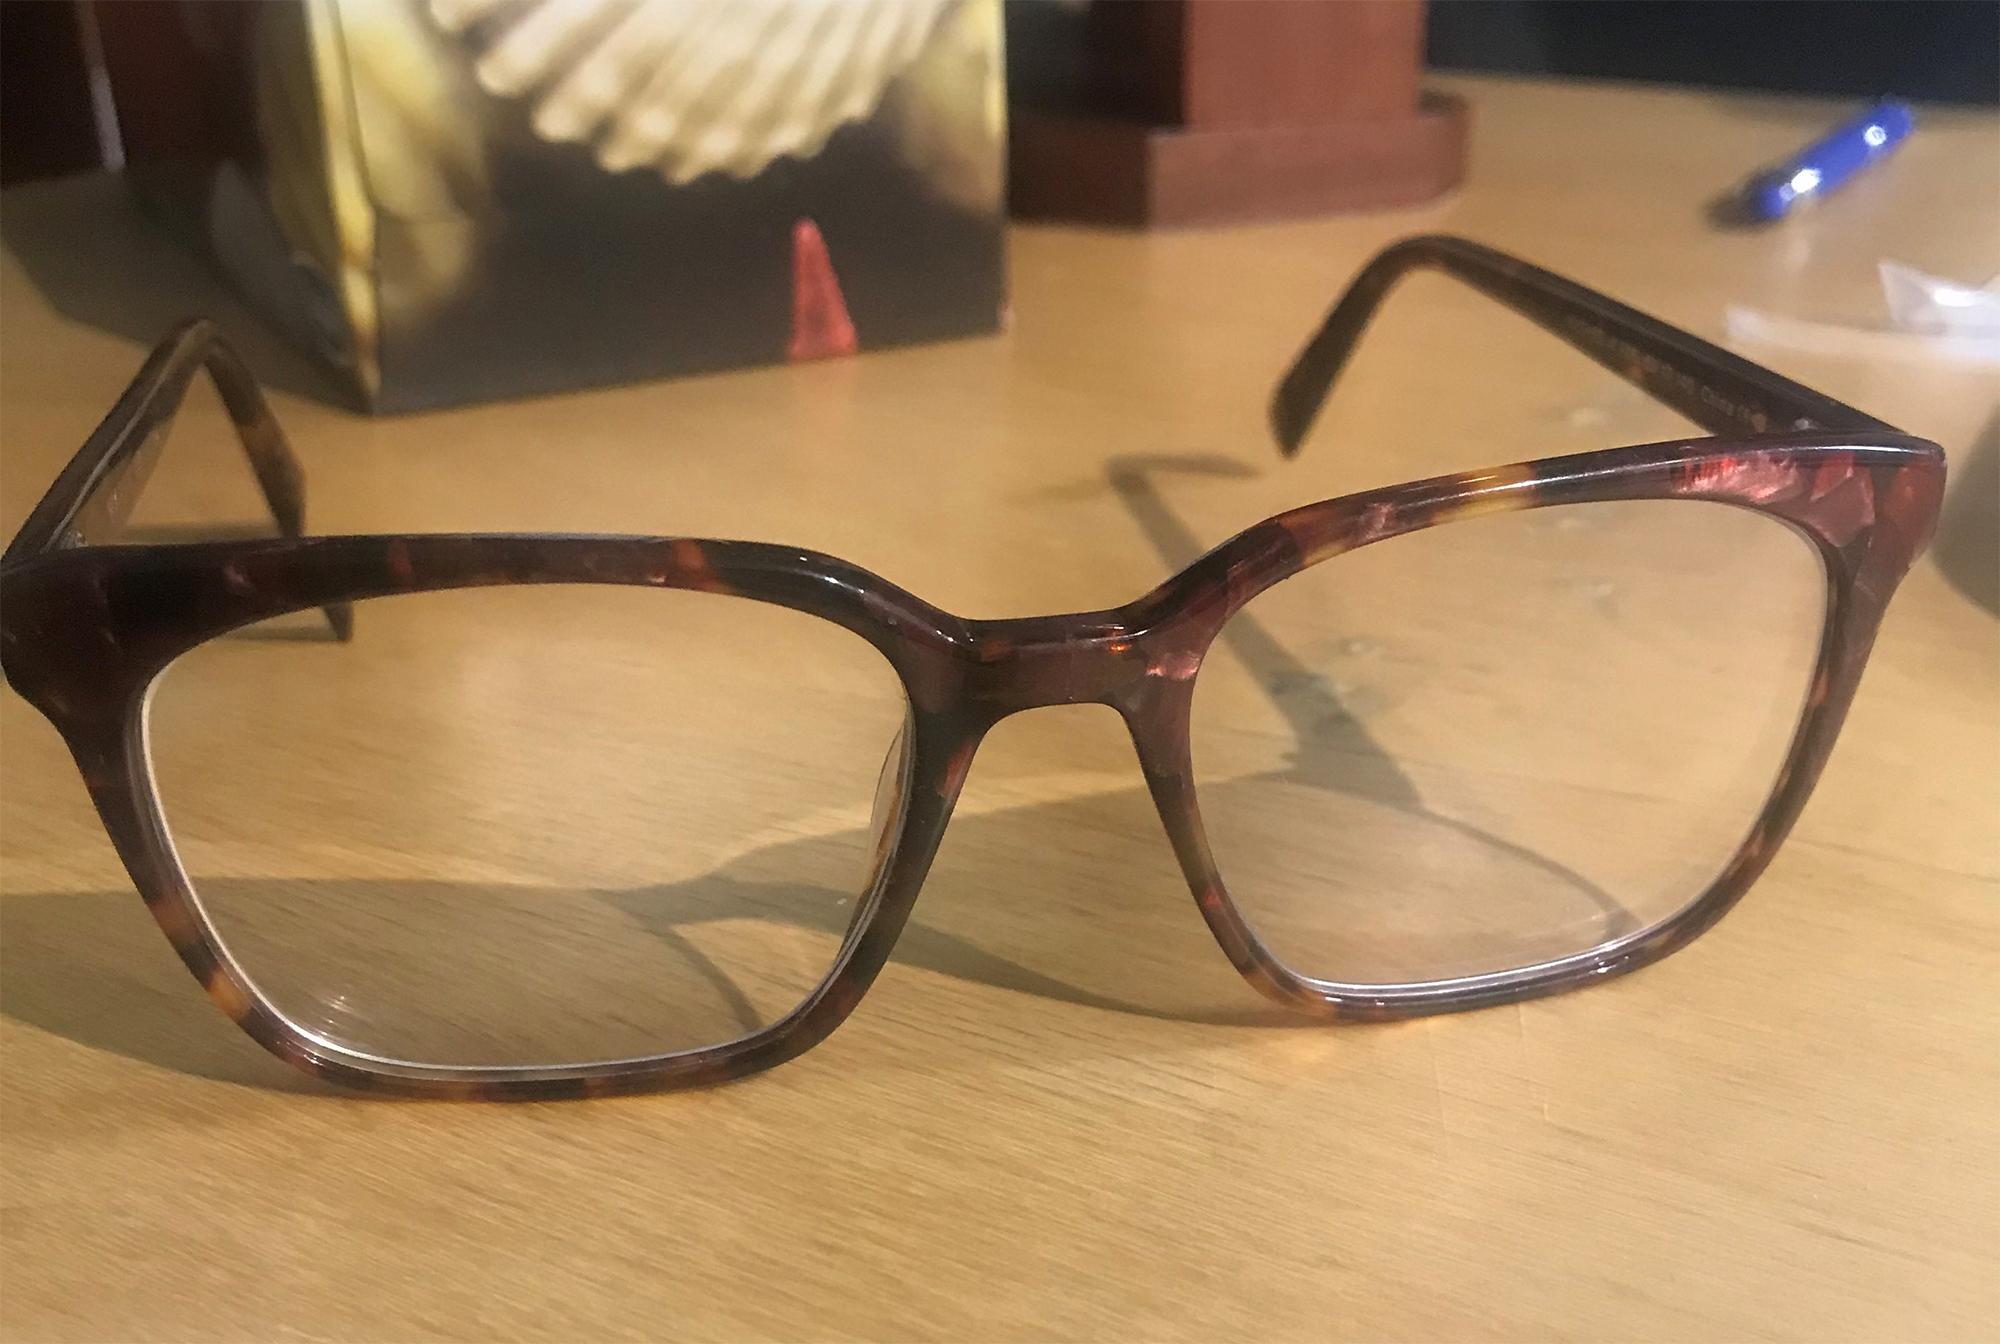 The Eyeglass Repair Centre 1 2 Hour Glasses Sunglasses Repairs Toronto Canadian Owned Jewellery Repairs